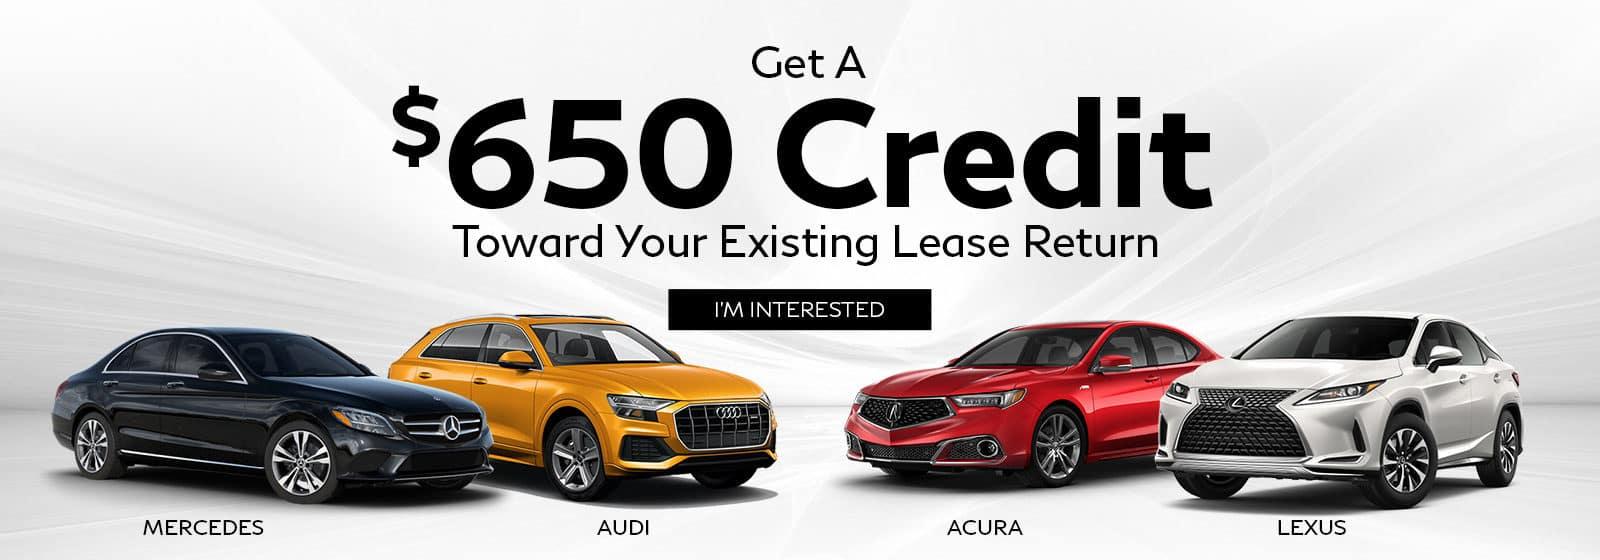 Lease Return Credit